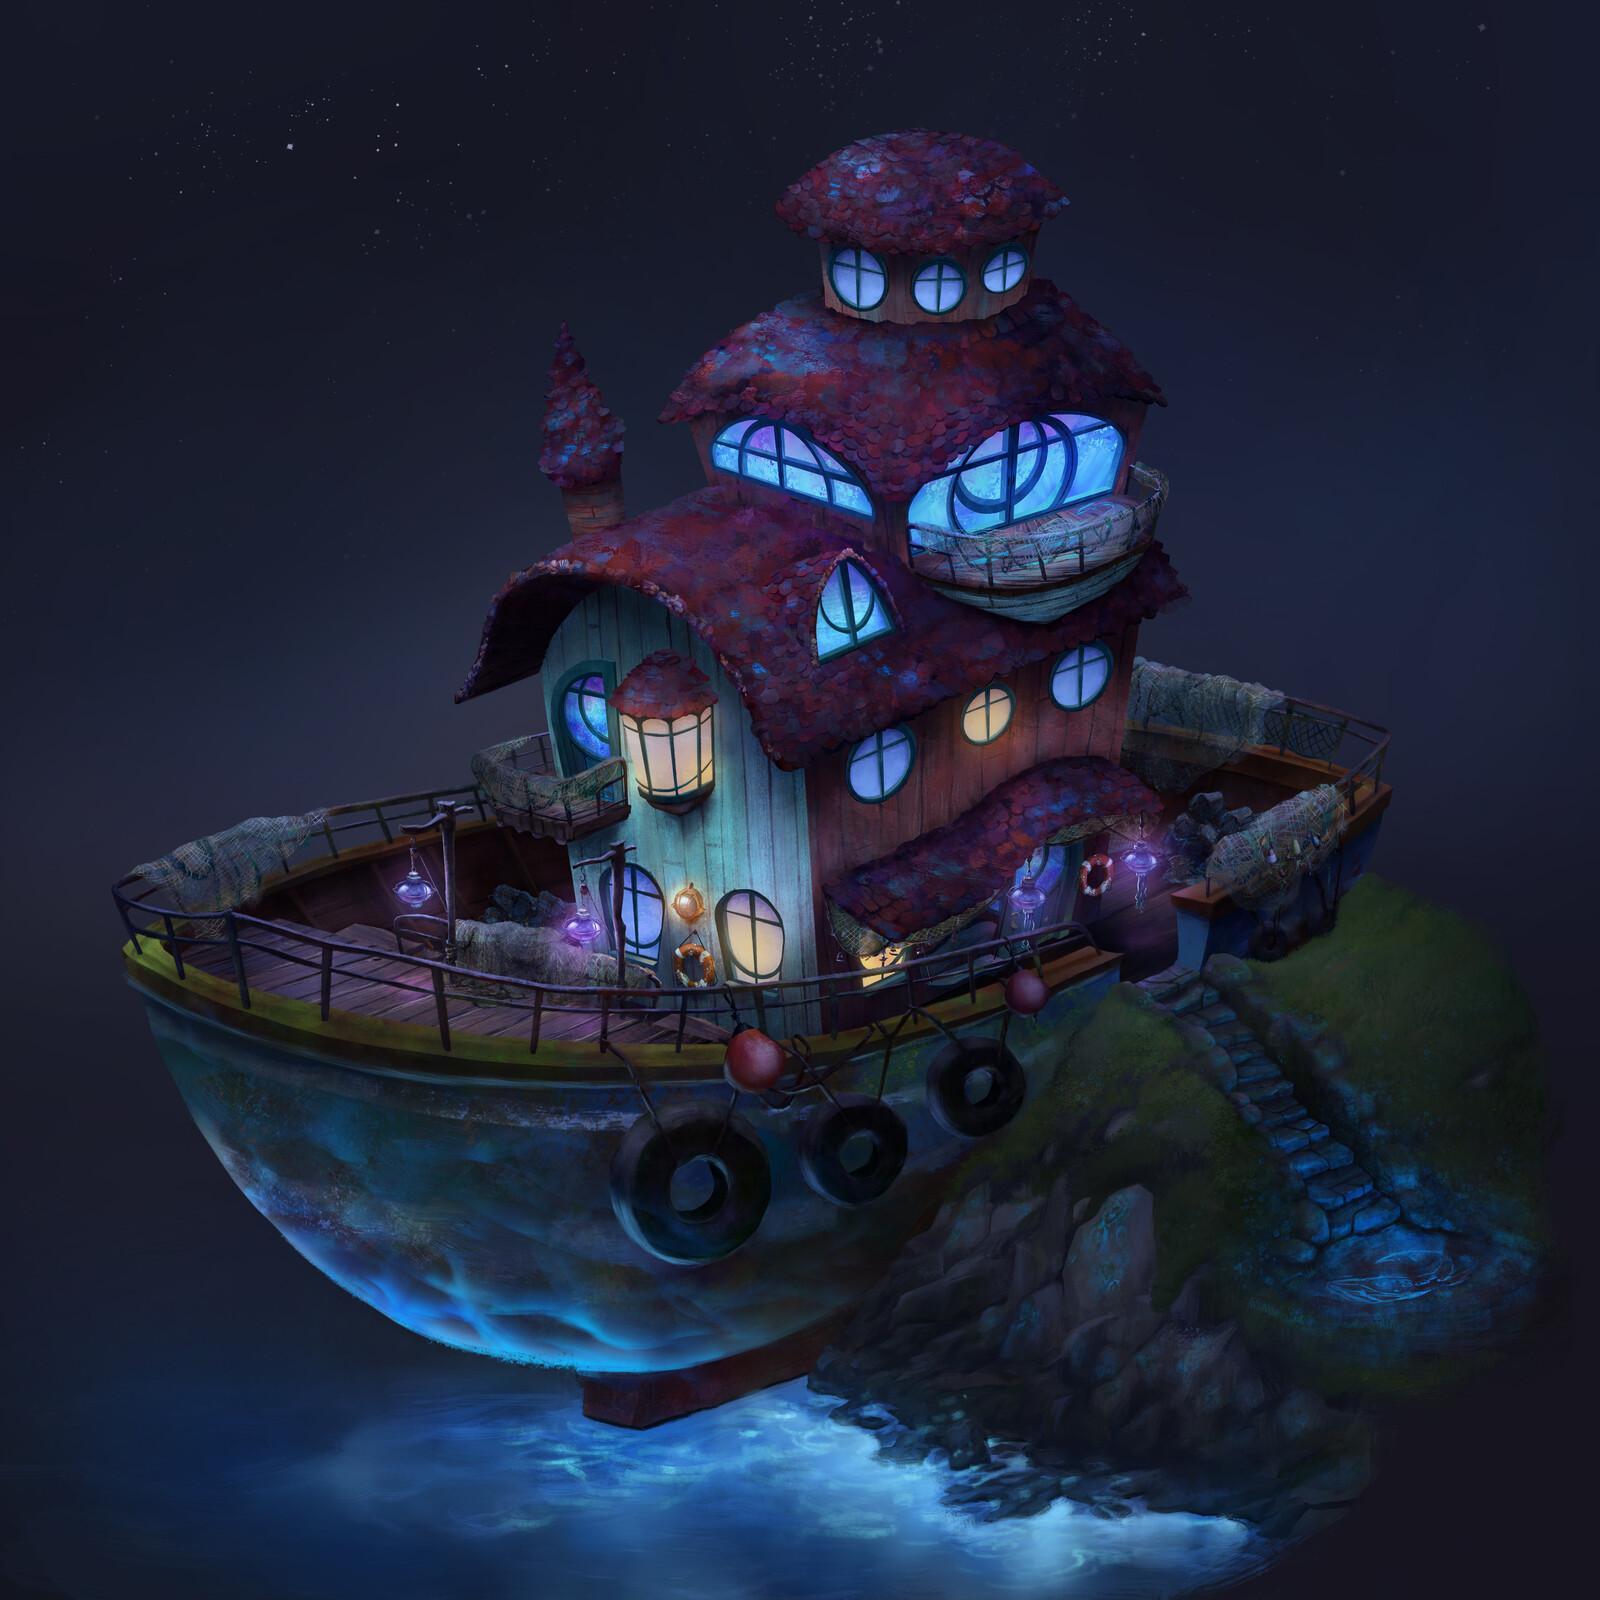 Eila's house: night version